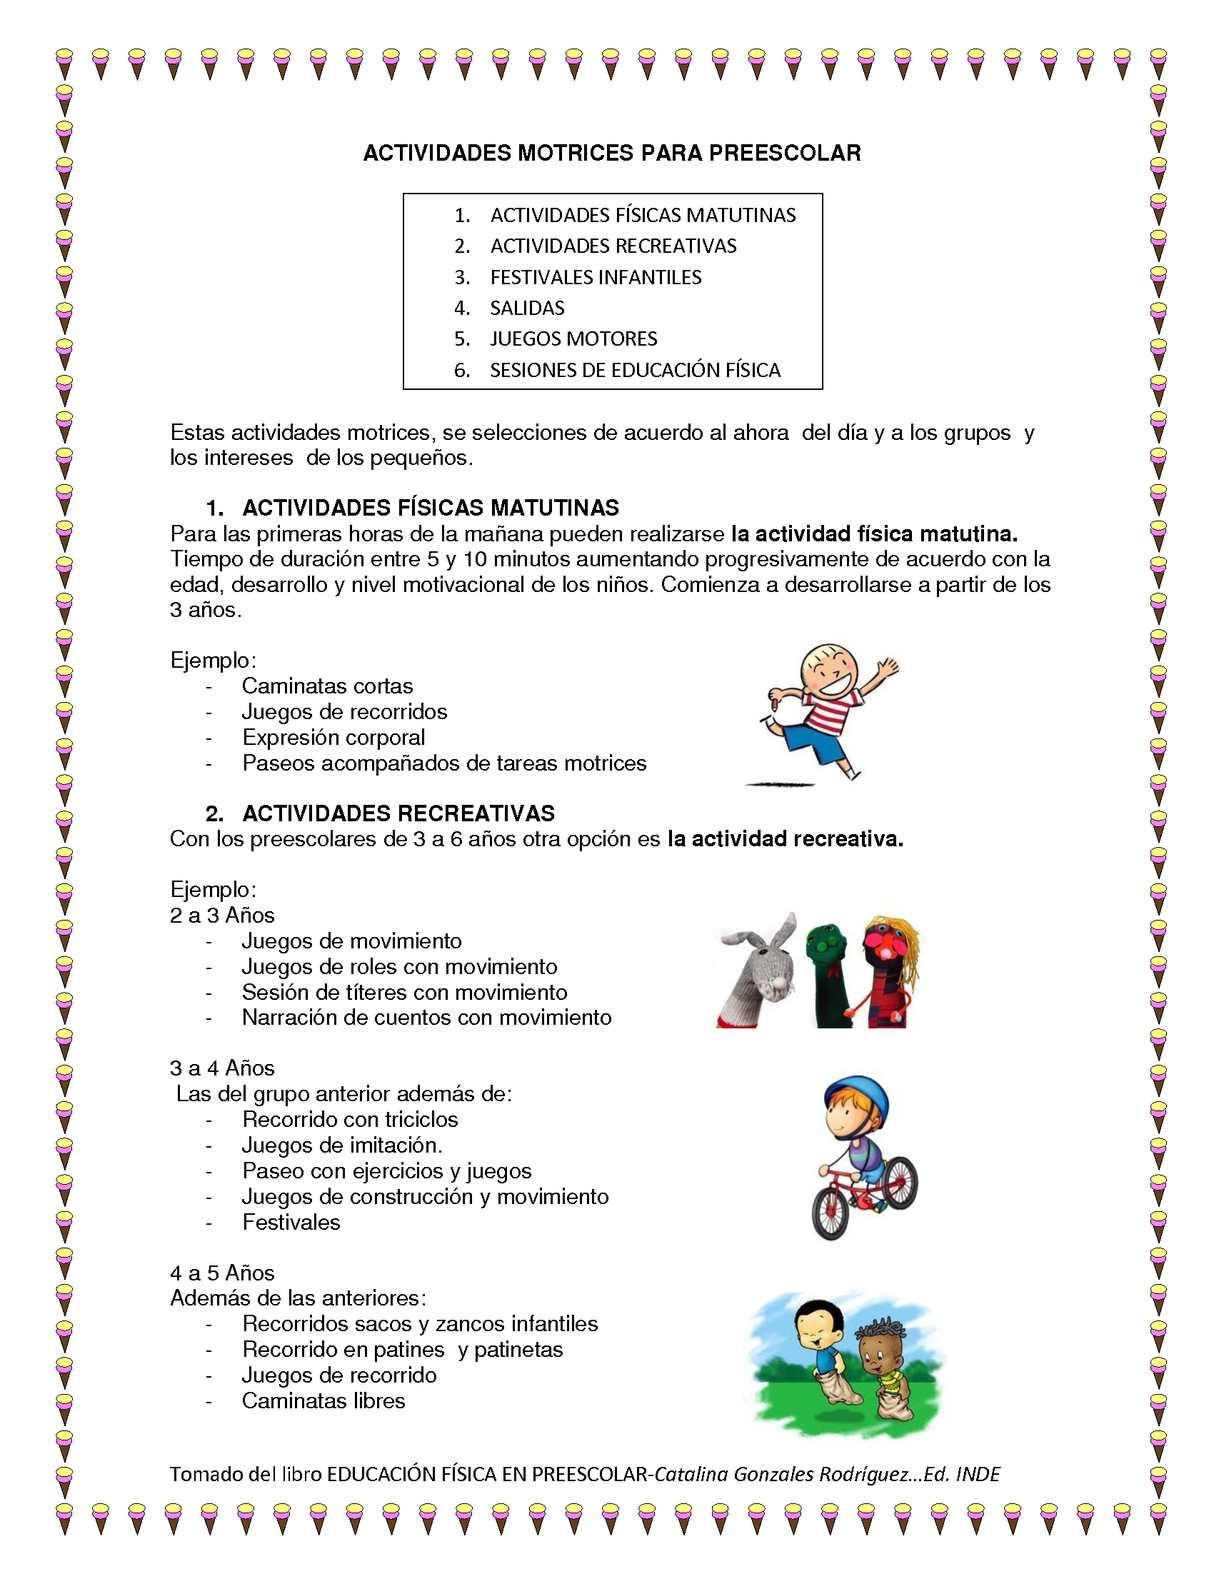 Calam o ejercicios de educacion fisica para preescolar for Actividades recreativas en el salon de clases